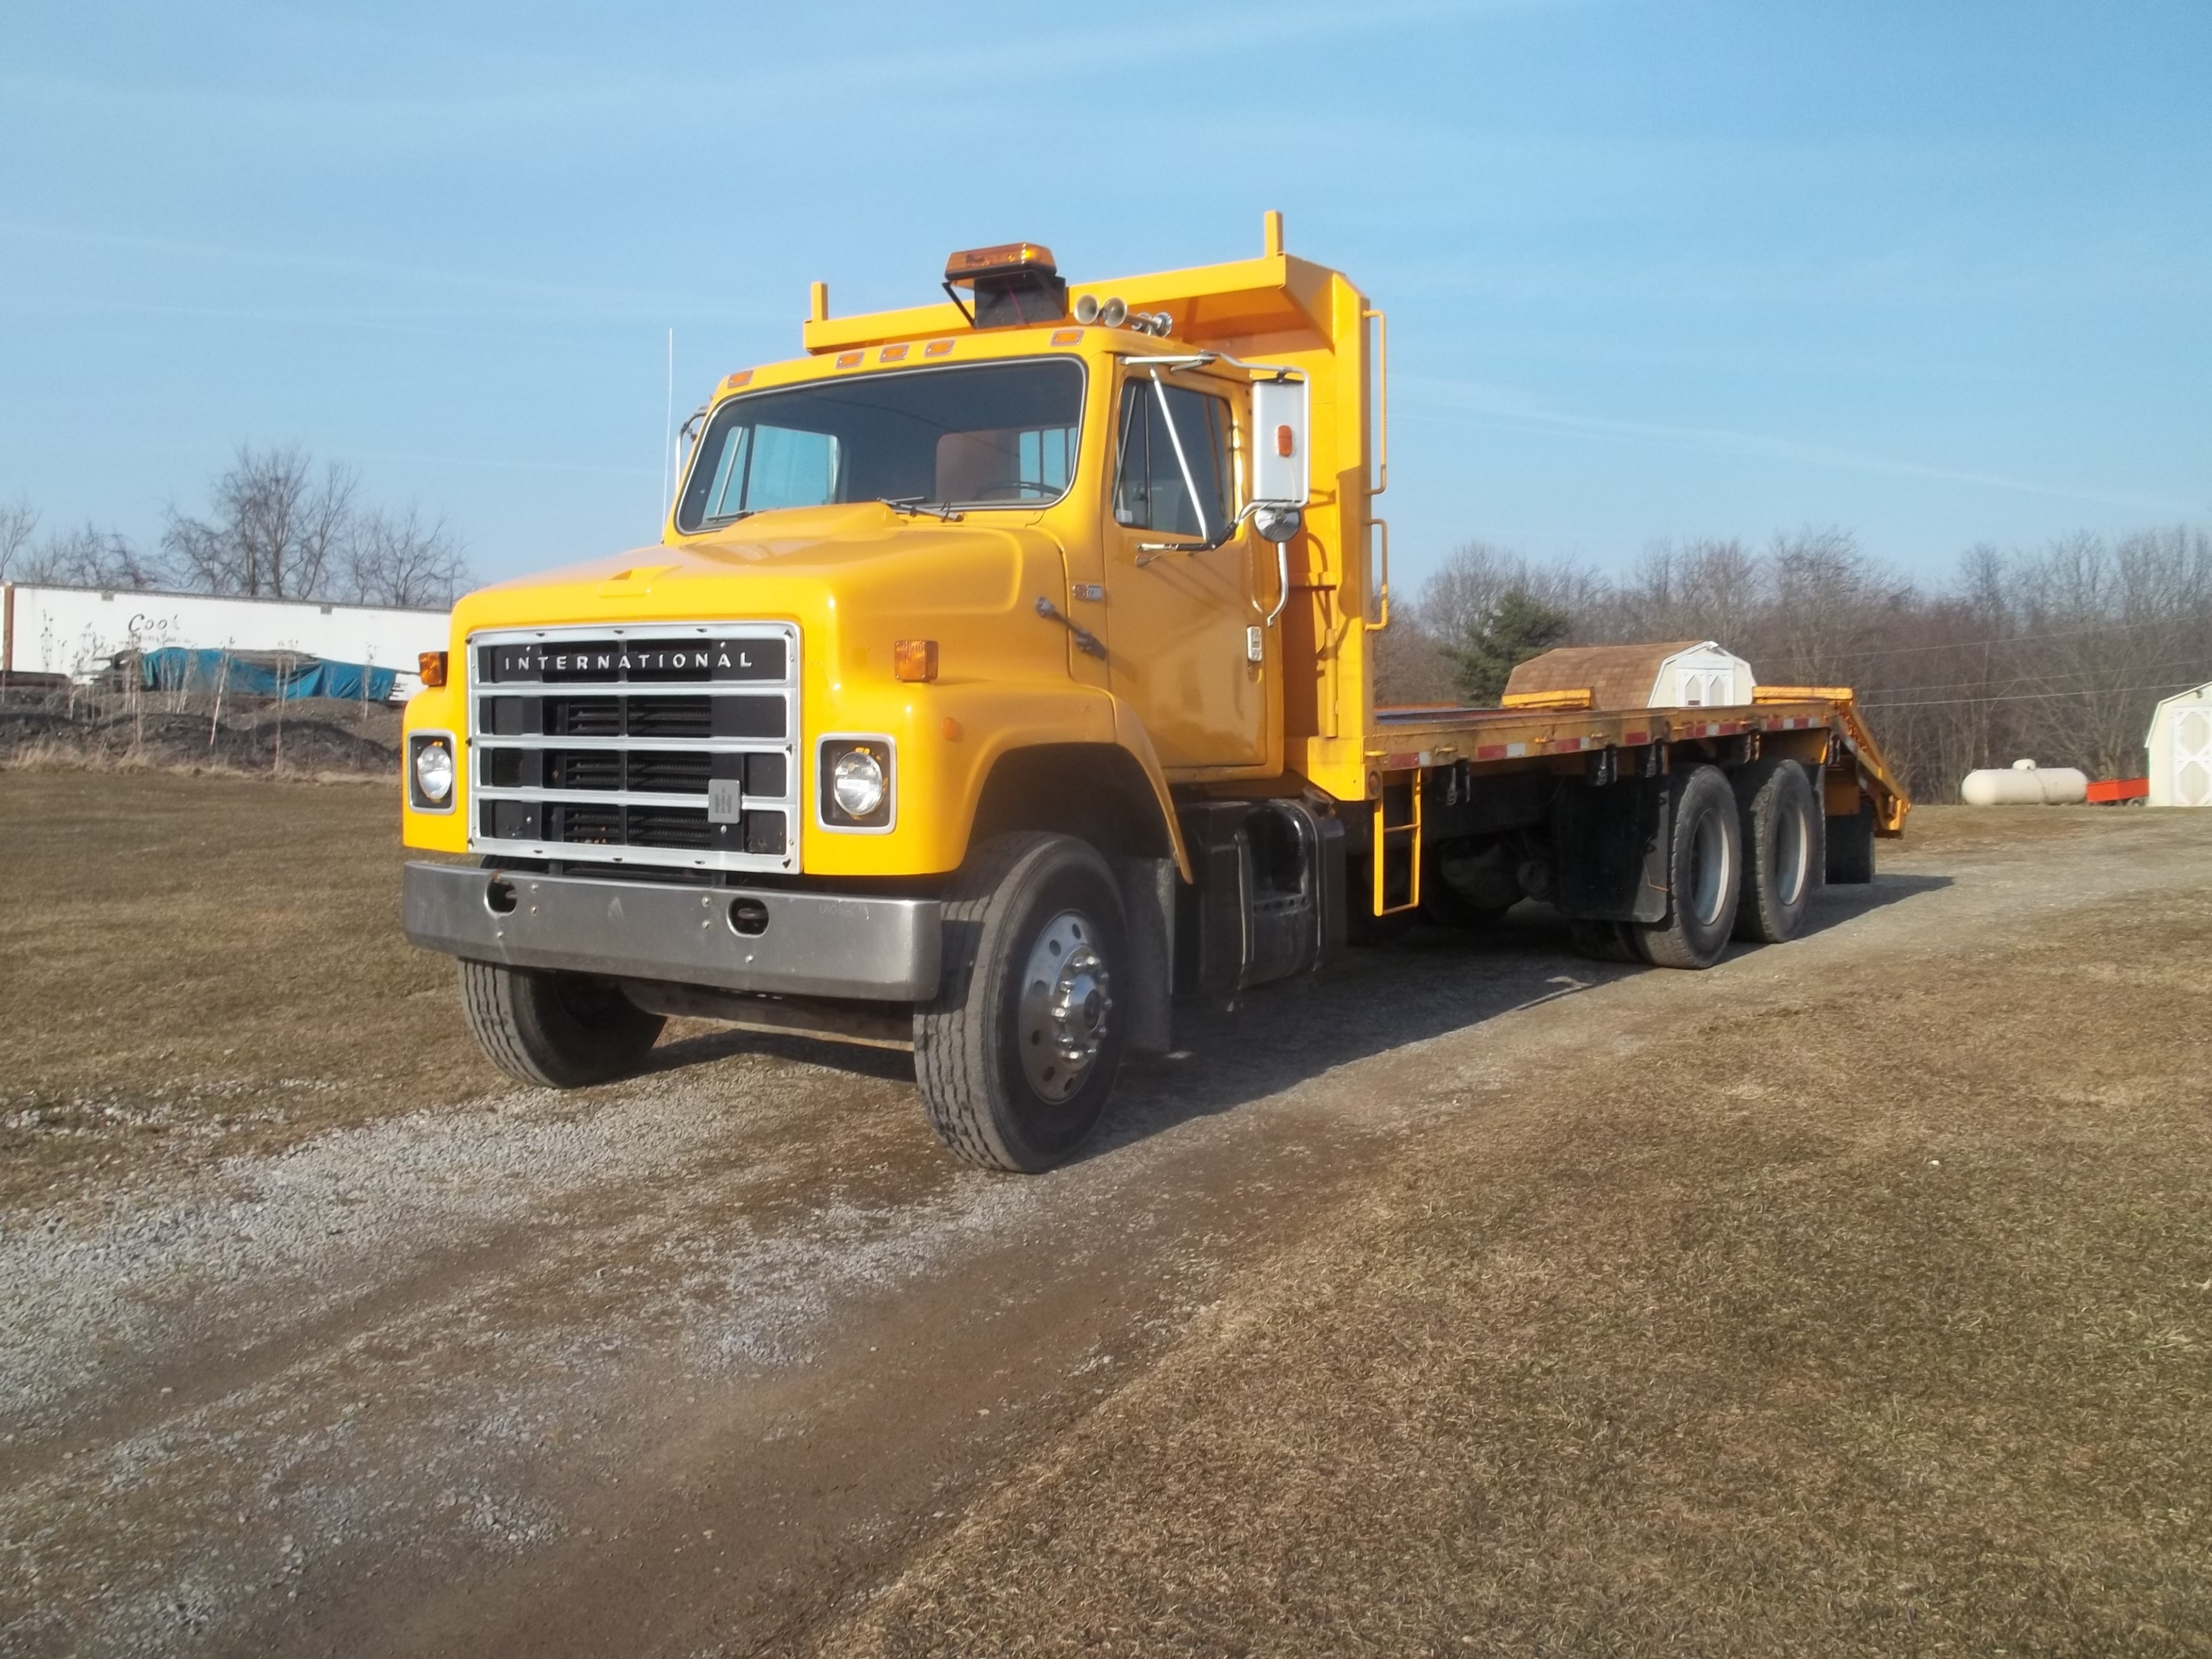 Used, 1986, International, S2300, Versatile Hauler Trucks